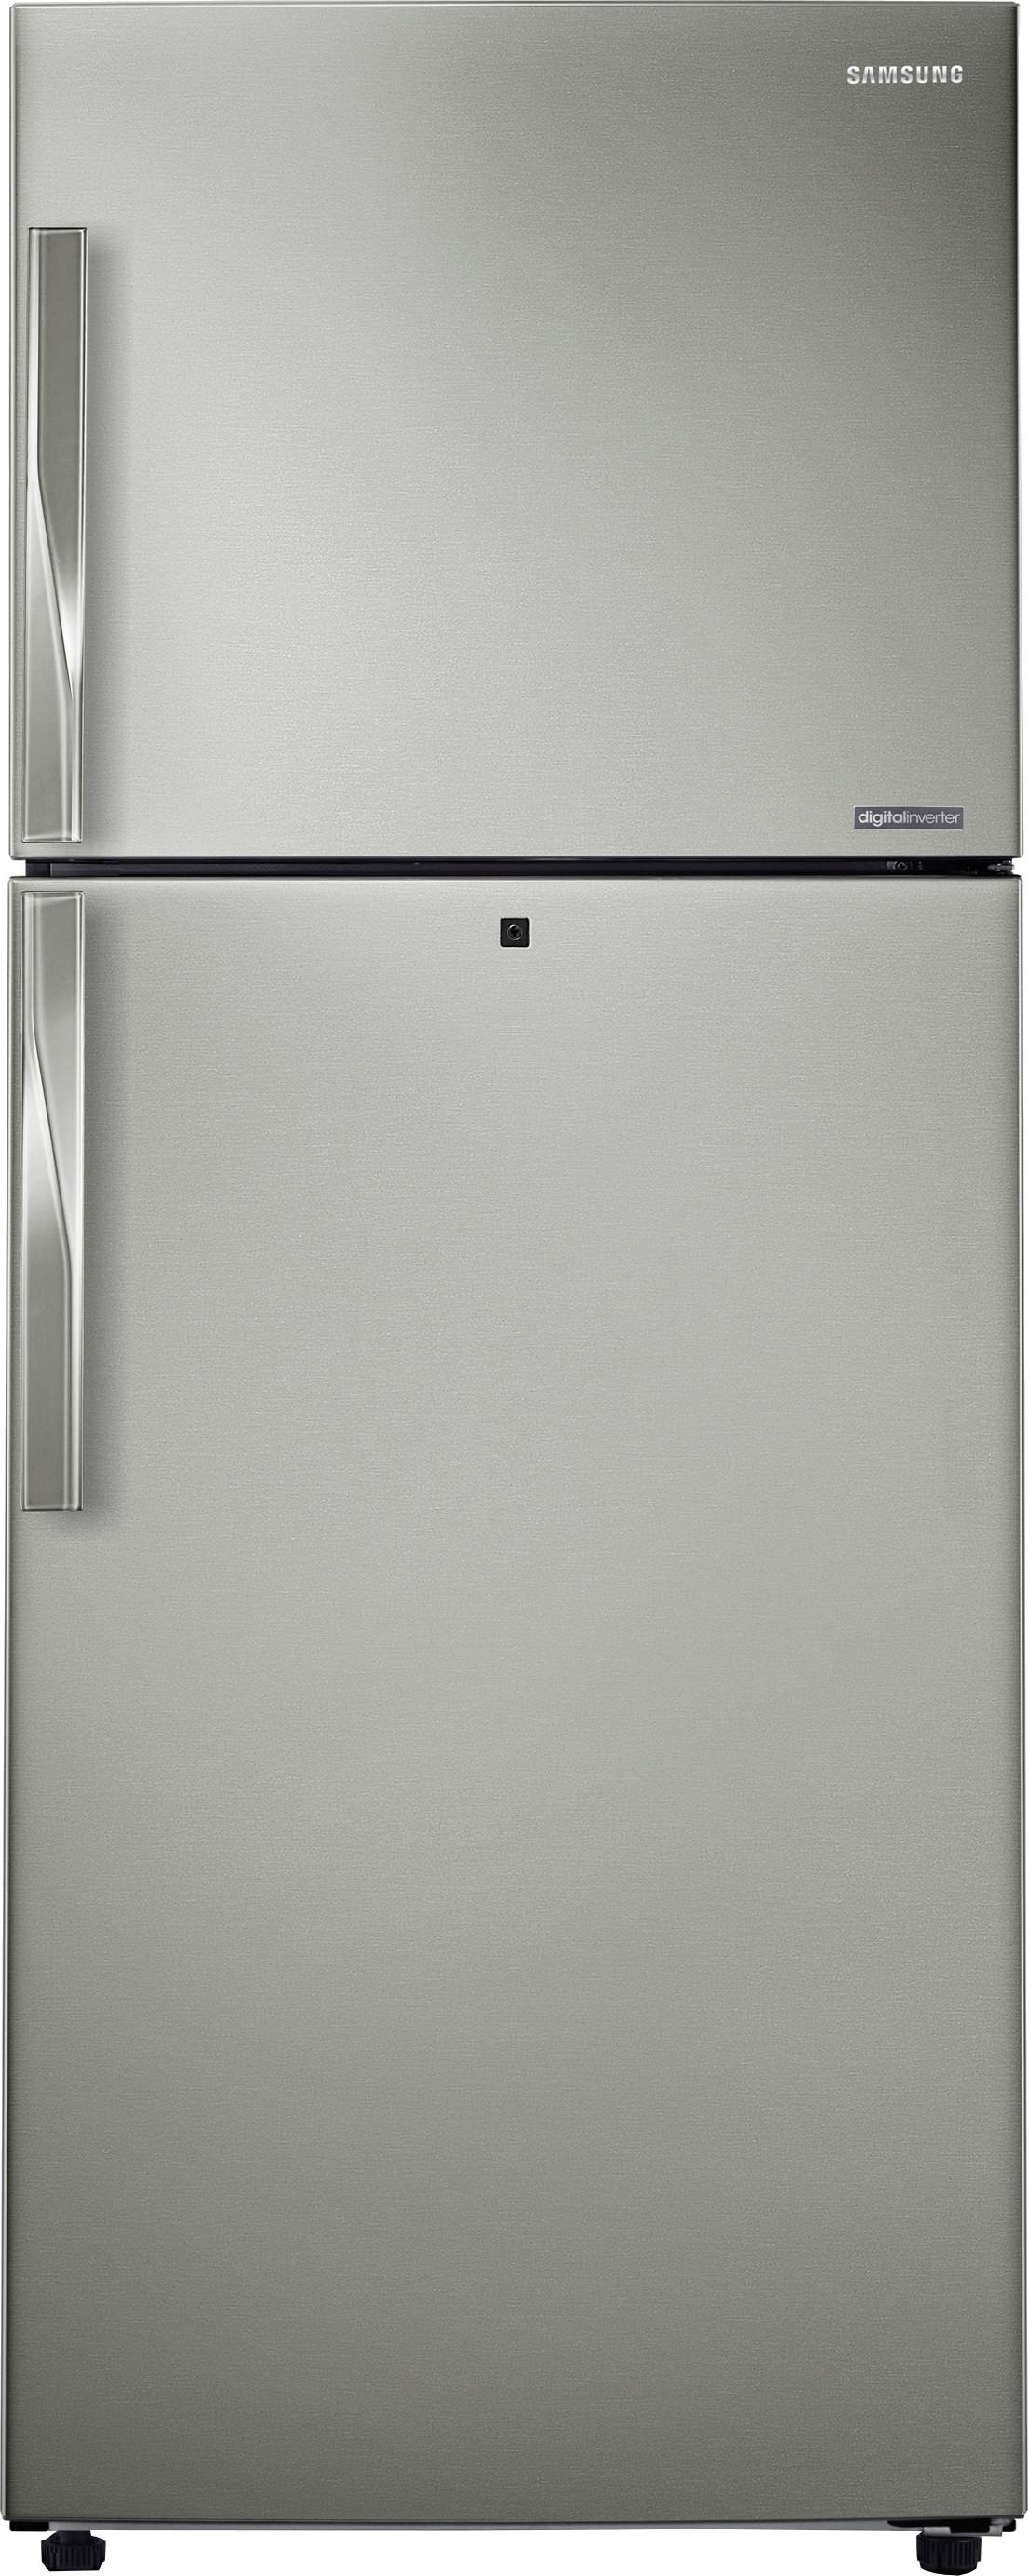 Samsung Double Door Refrigerator RT39FAJTASP Image